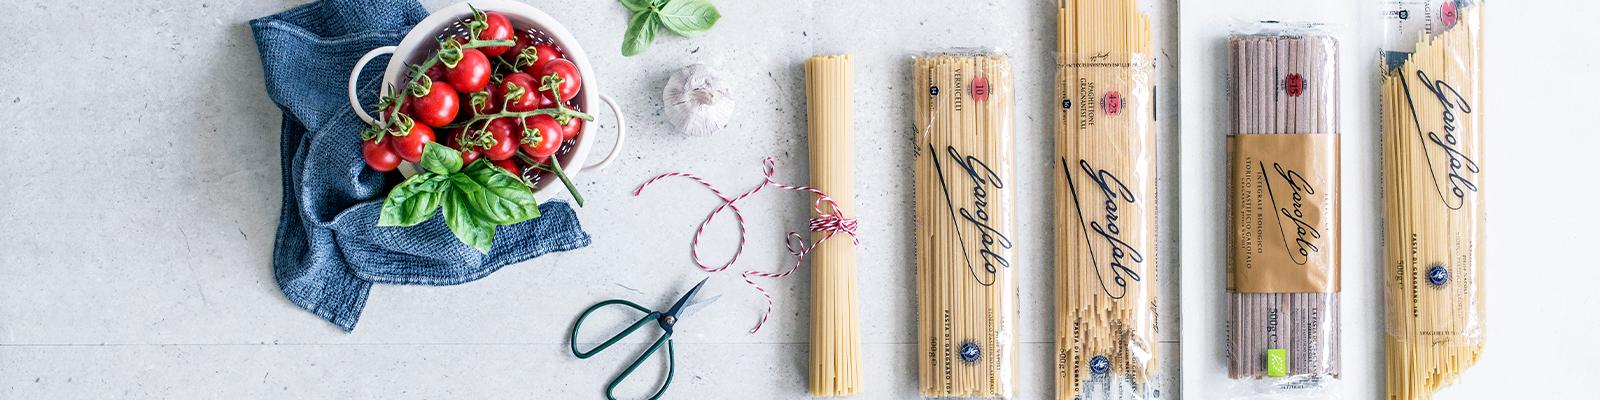 Pasta Garofalo - Massa Longa